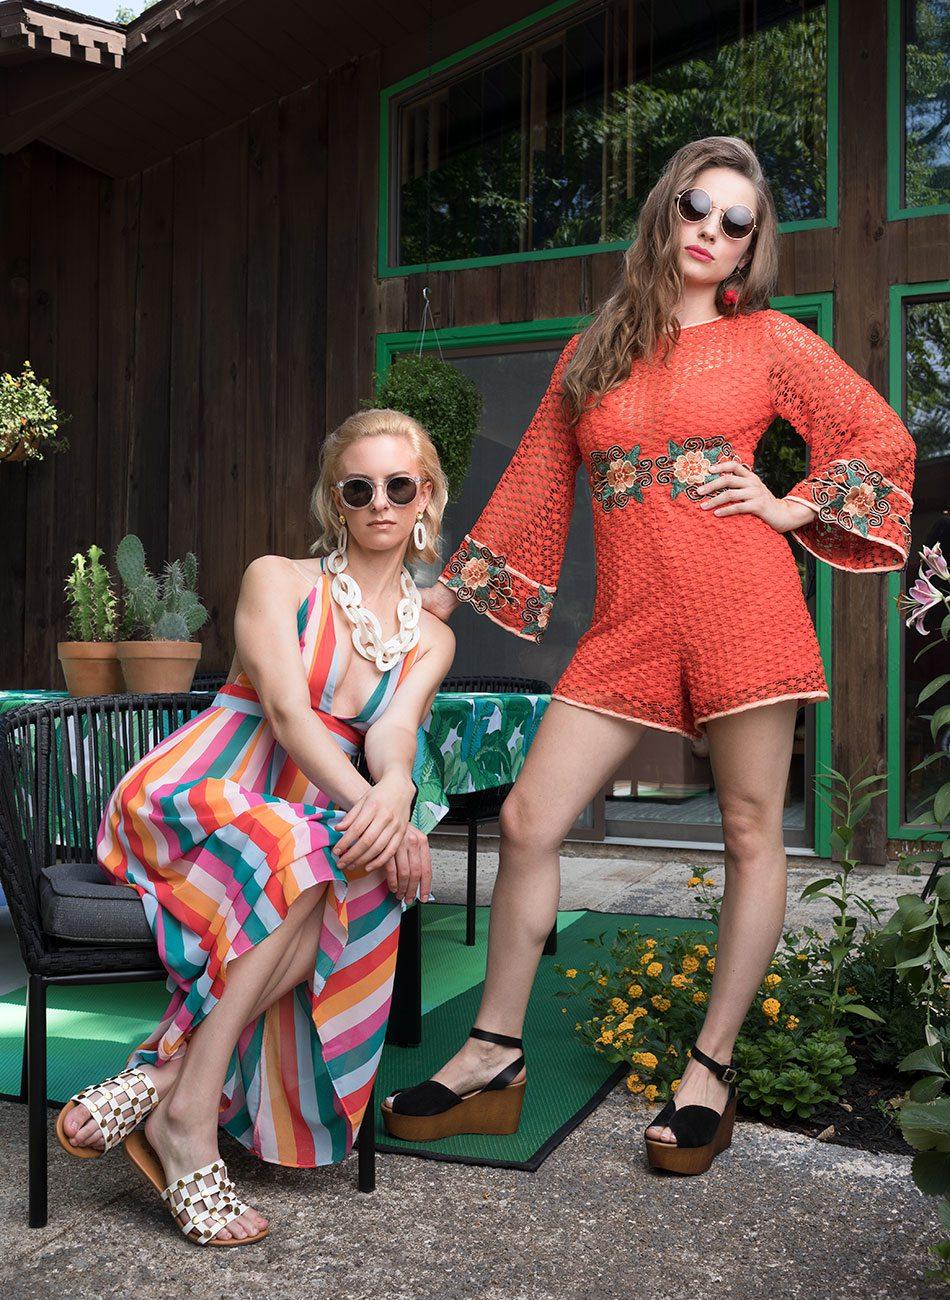 stylish women in backyard garden